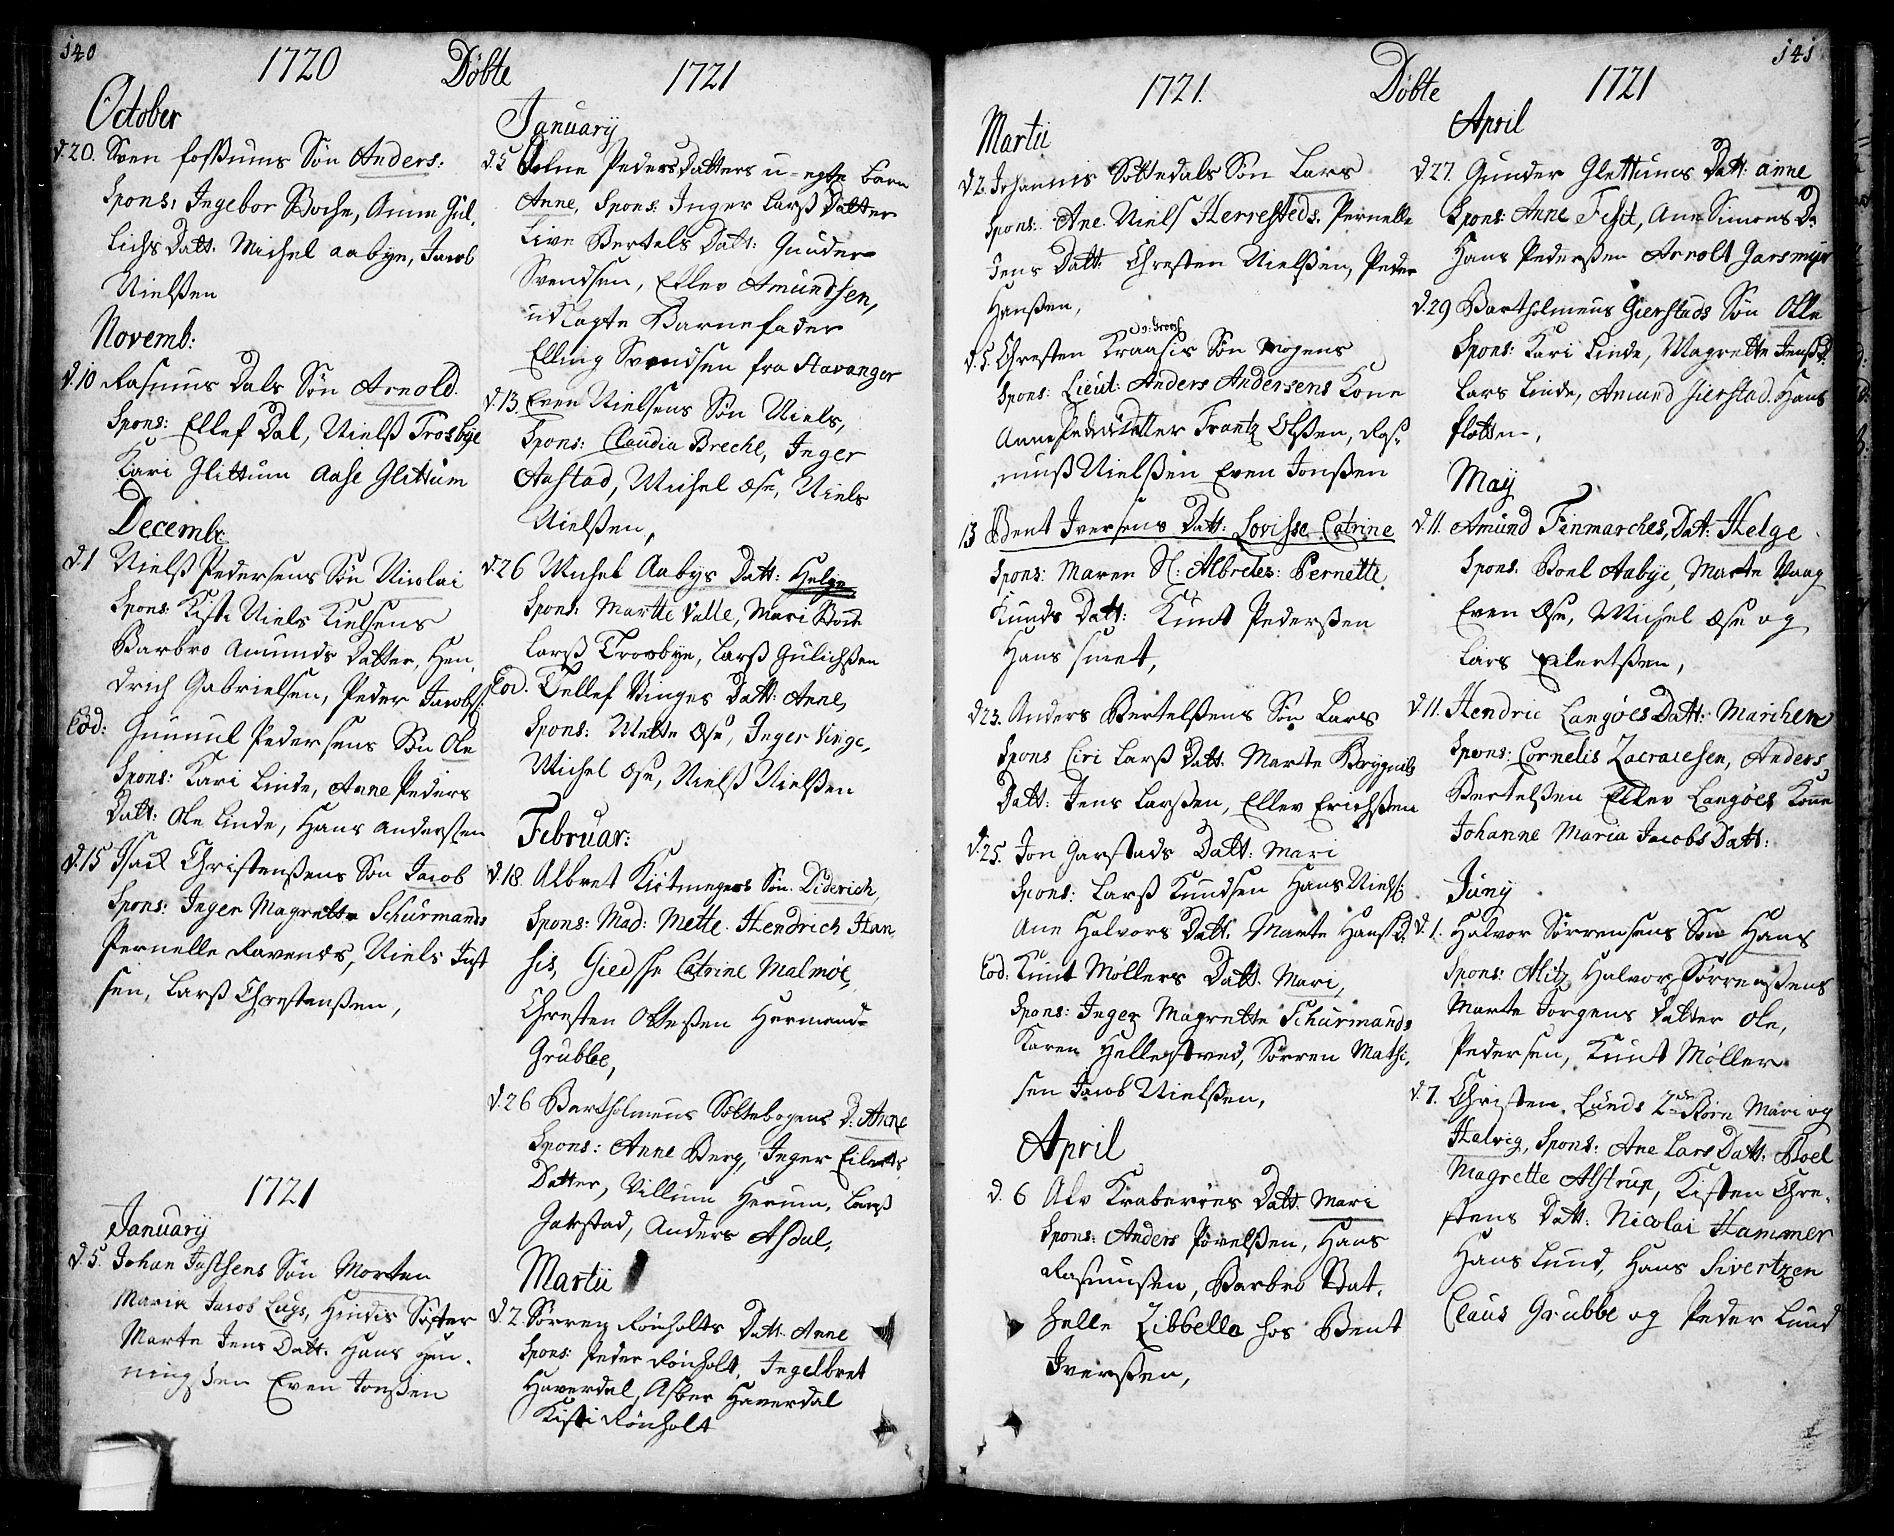 SAKO, Bamble kirkebøker, F/Fa/L0001: Ministerialbok nr. I 1, 1702-1774, s. 140-141